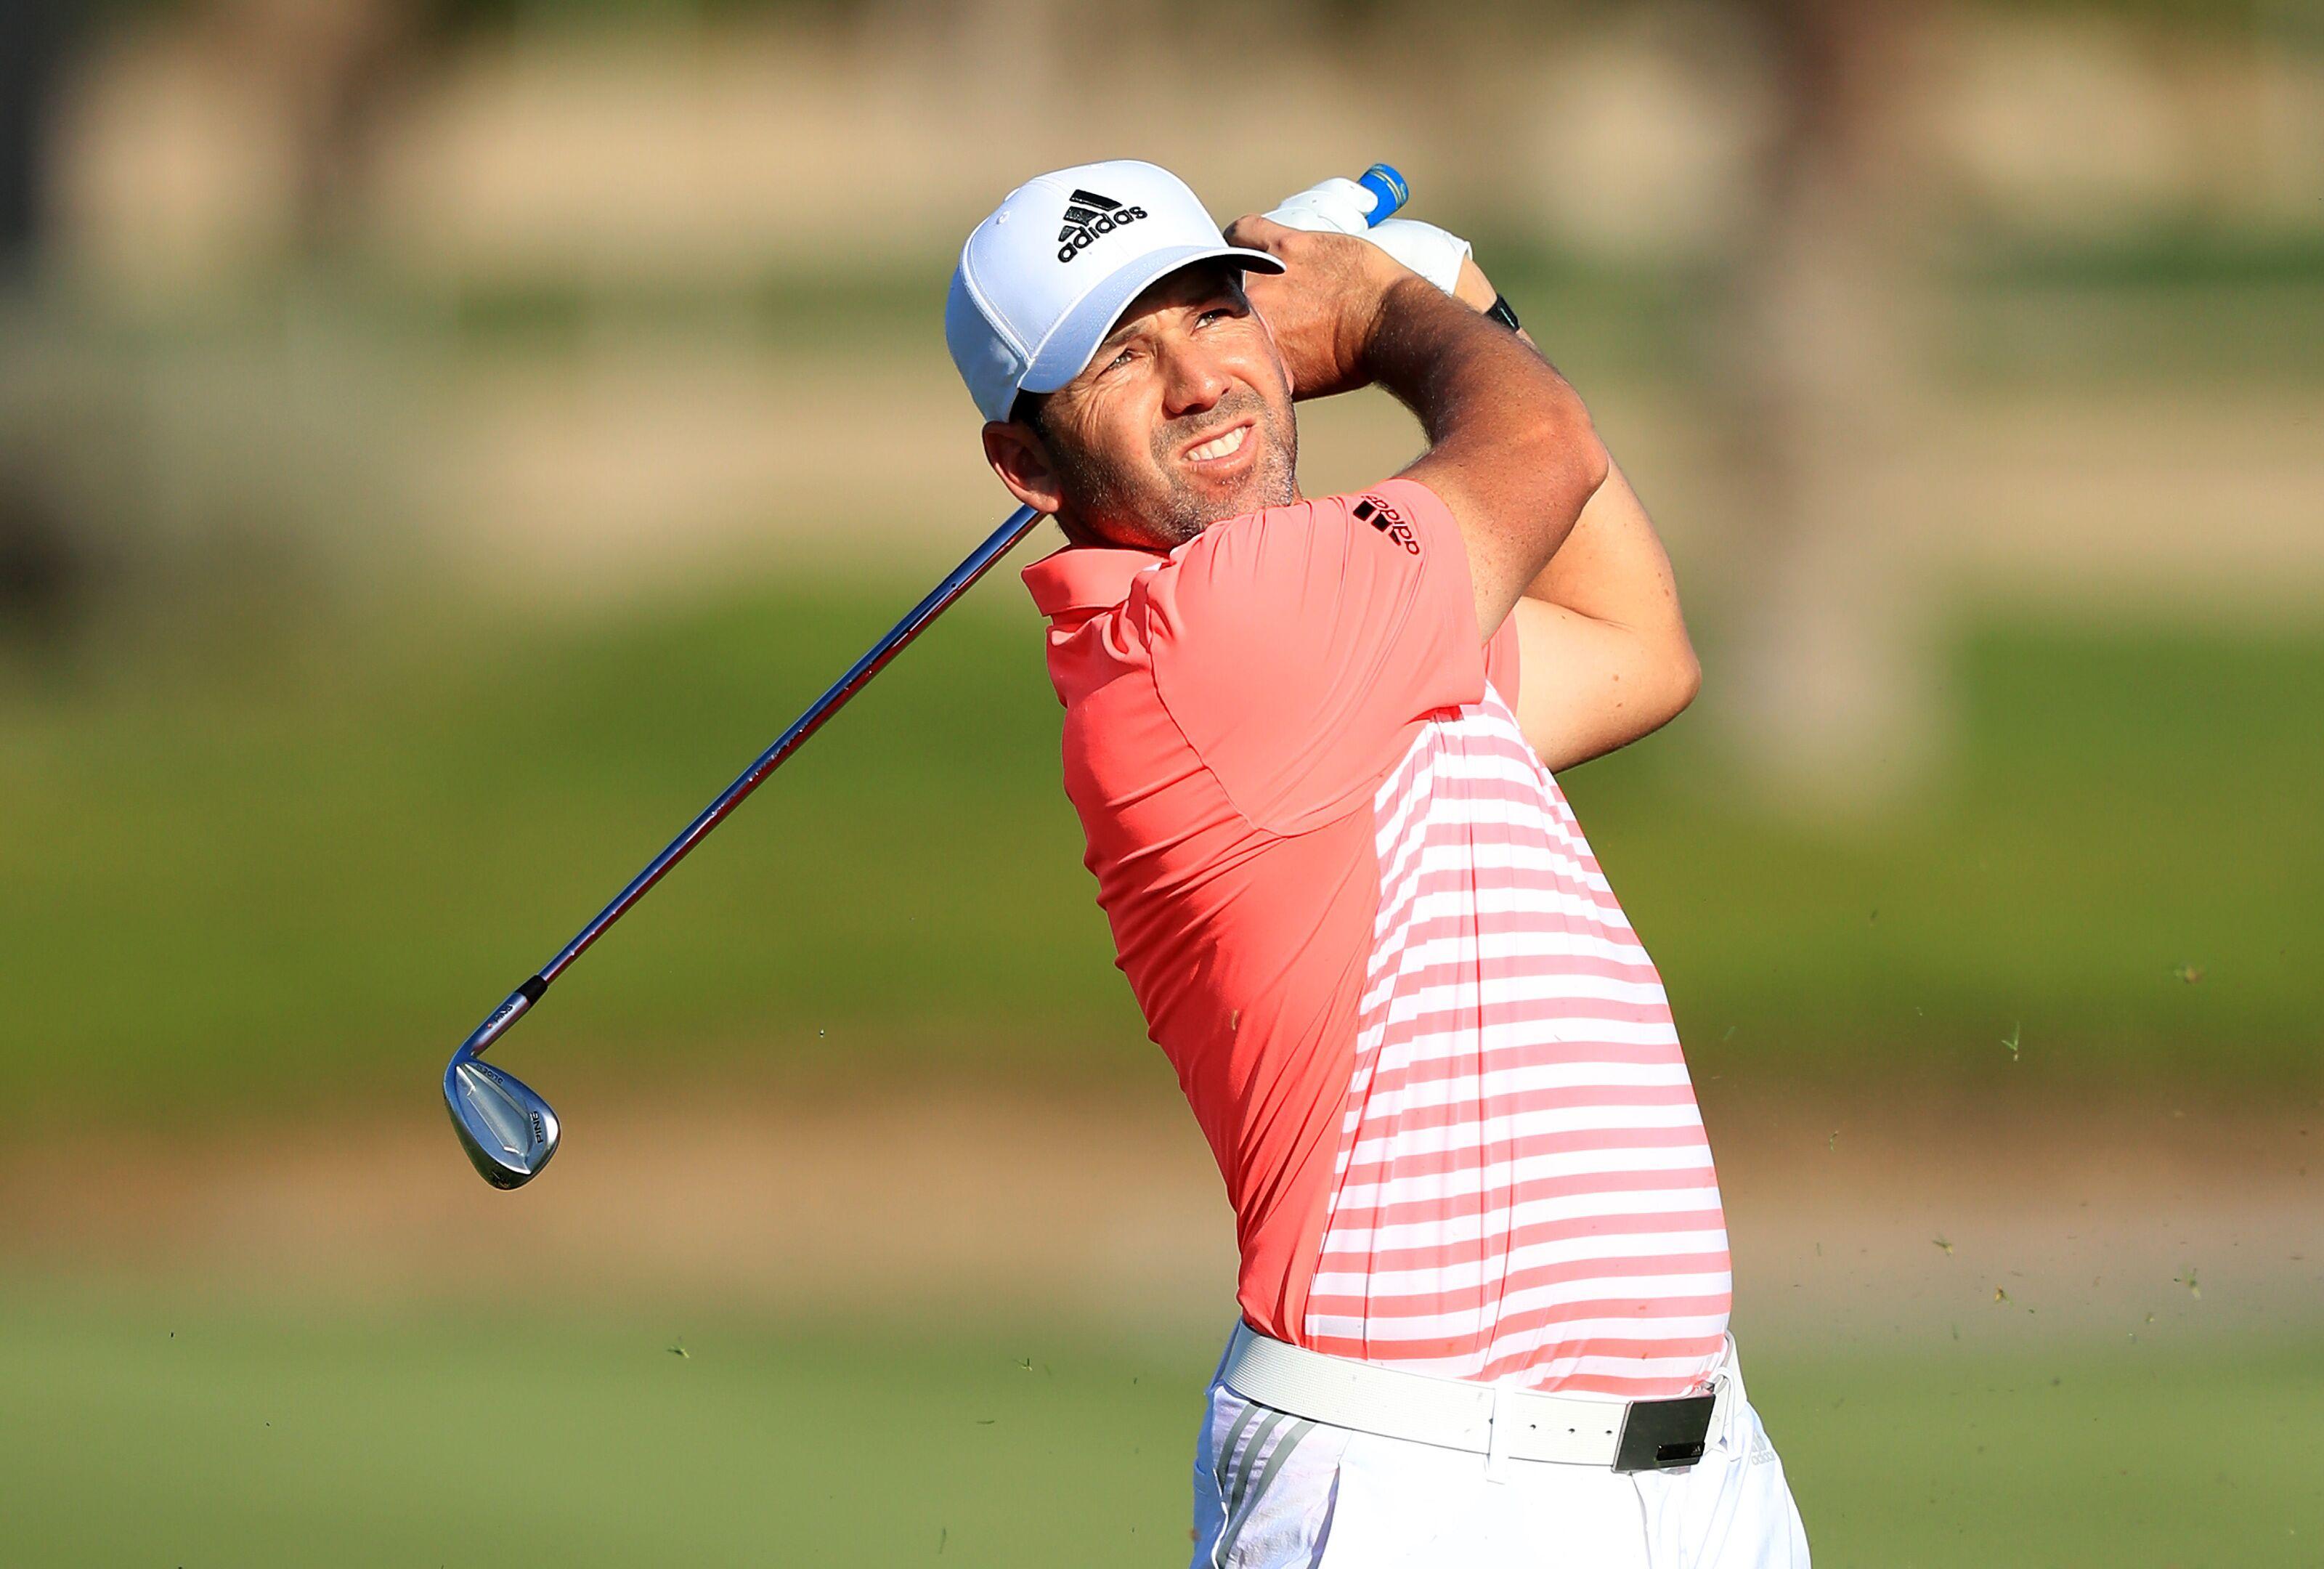 European Tour DFS golf: Omega Dubai Desert Classic DraftKings player picks